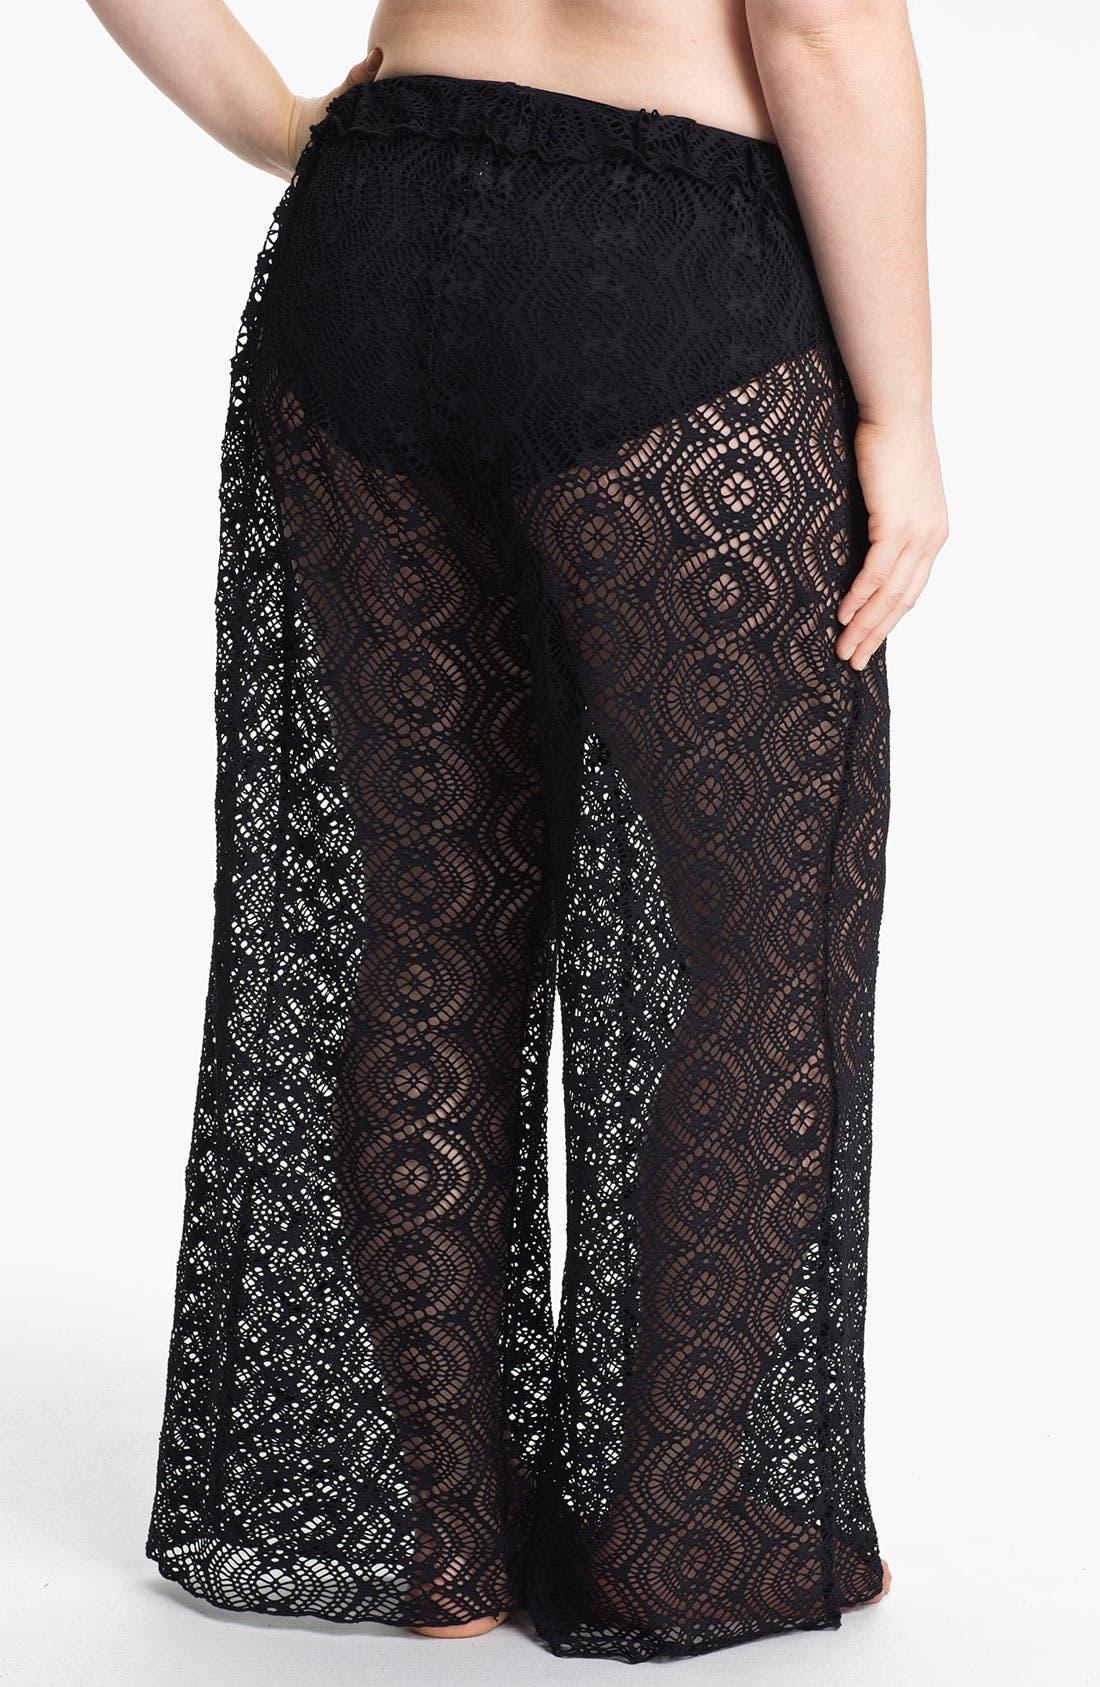 Alternate Image 2  - Becca Etc. 'Marbella' Crochet Cover-Up Pants (Plus Size)